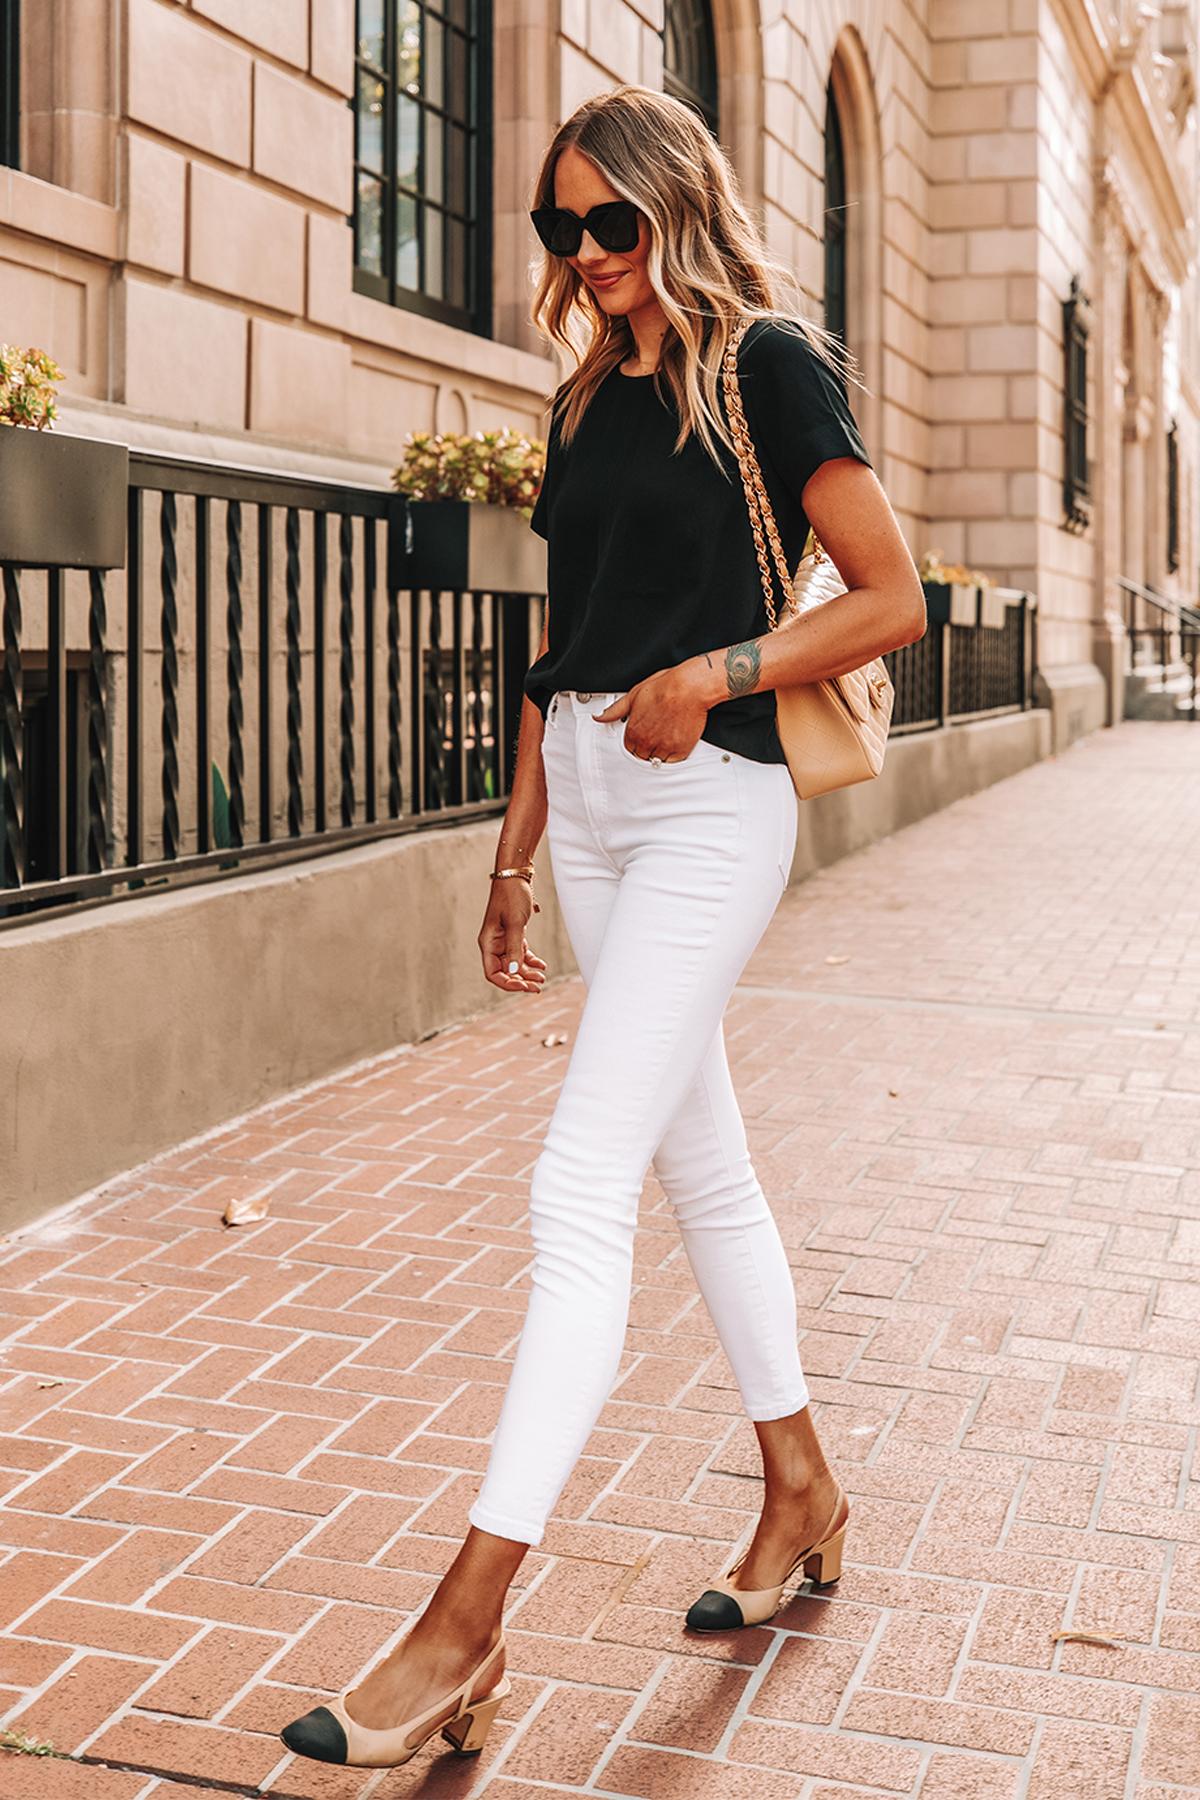 Fashion Jackson Wearing Everlane Black Top Everlane High Rise White Skinny Jeans Chanel Slingbacks Chanel Beige Handbag 2